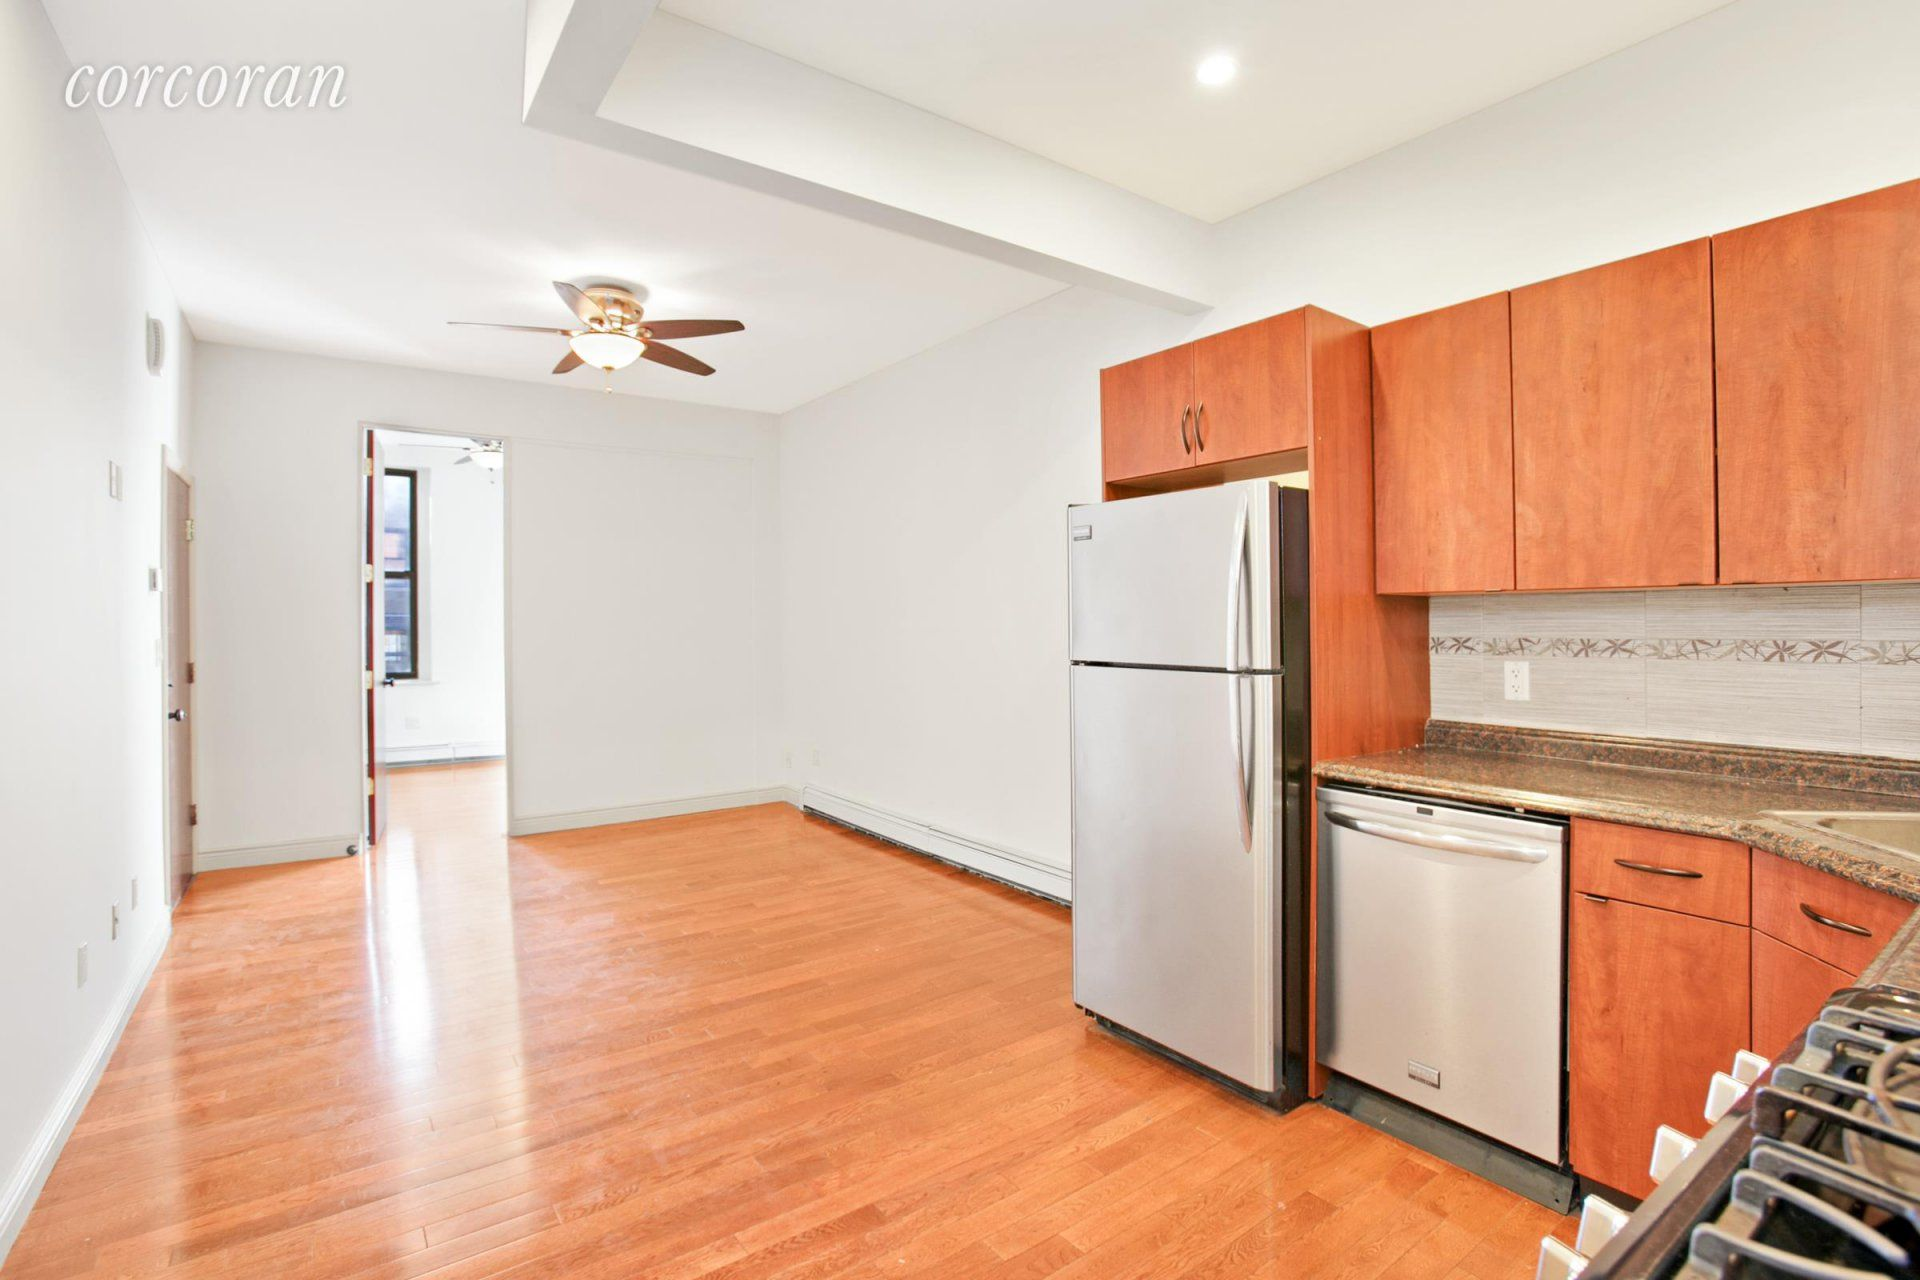 Ad Rental Apartment Brooklyn (11215) ref5642138 1